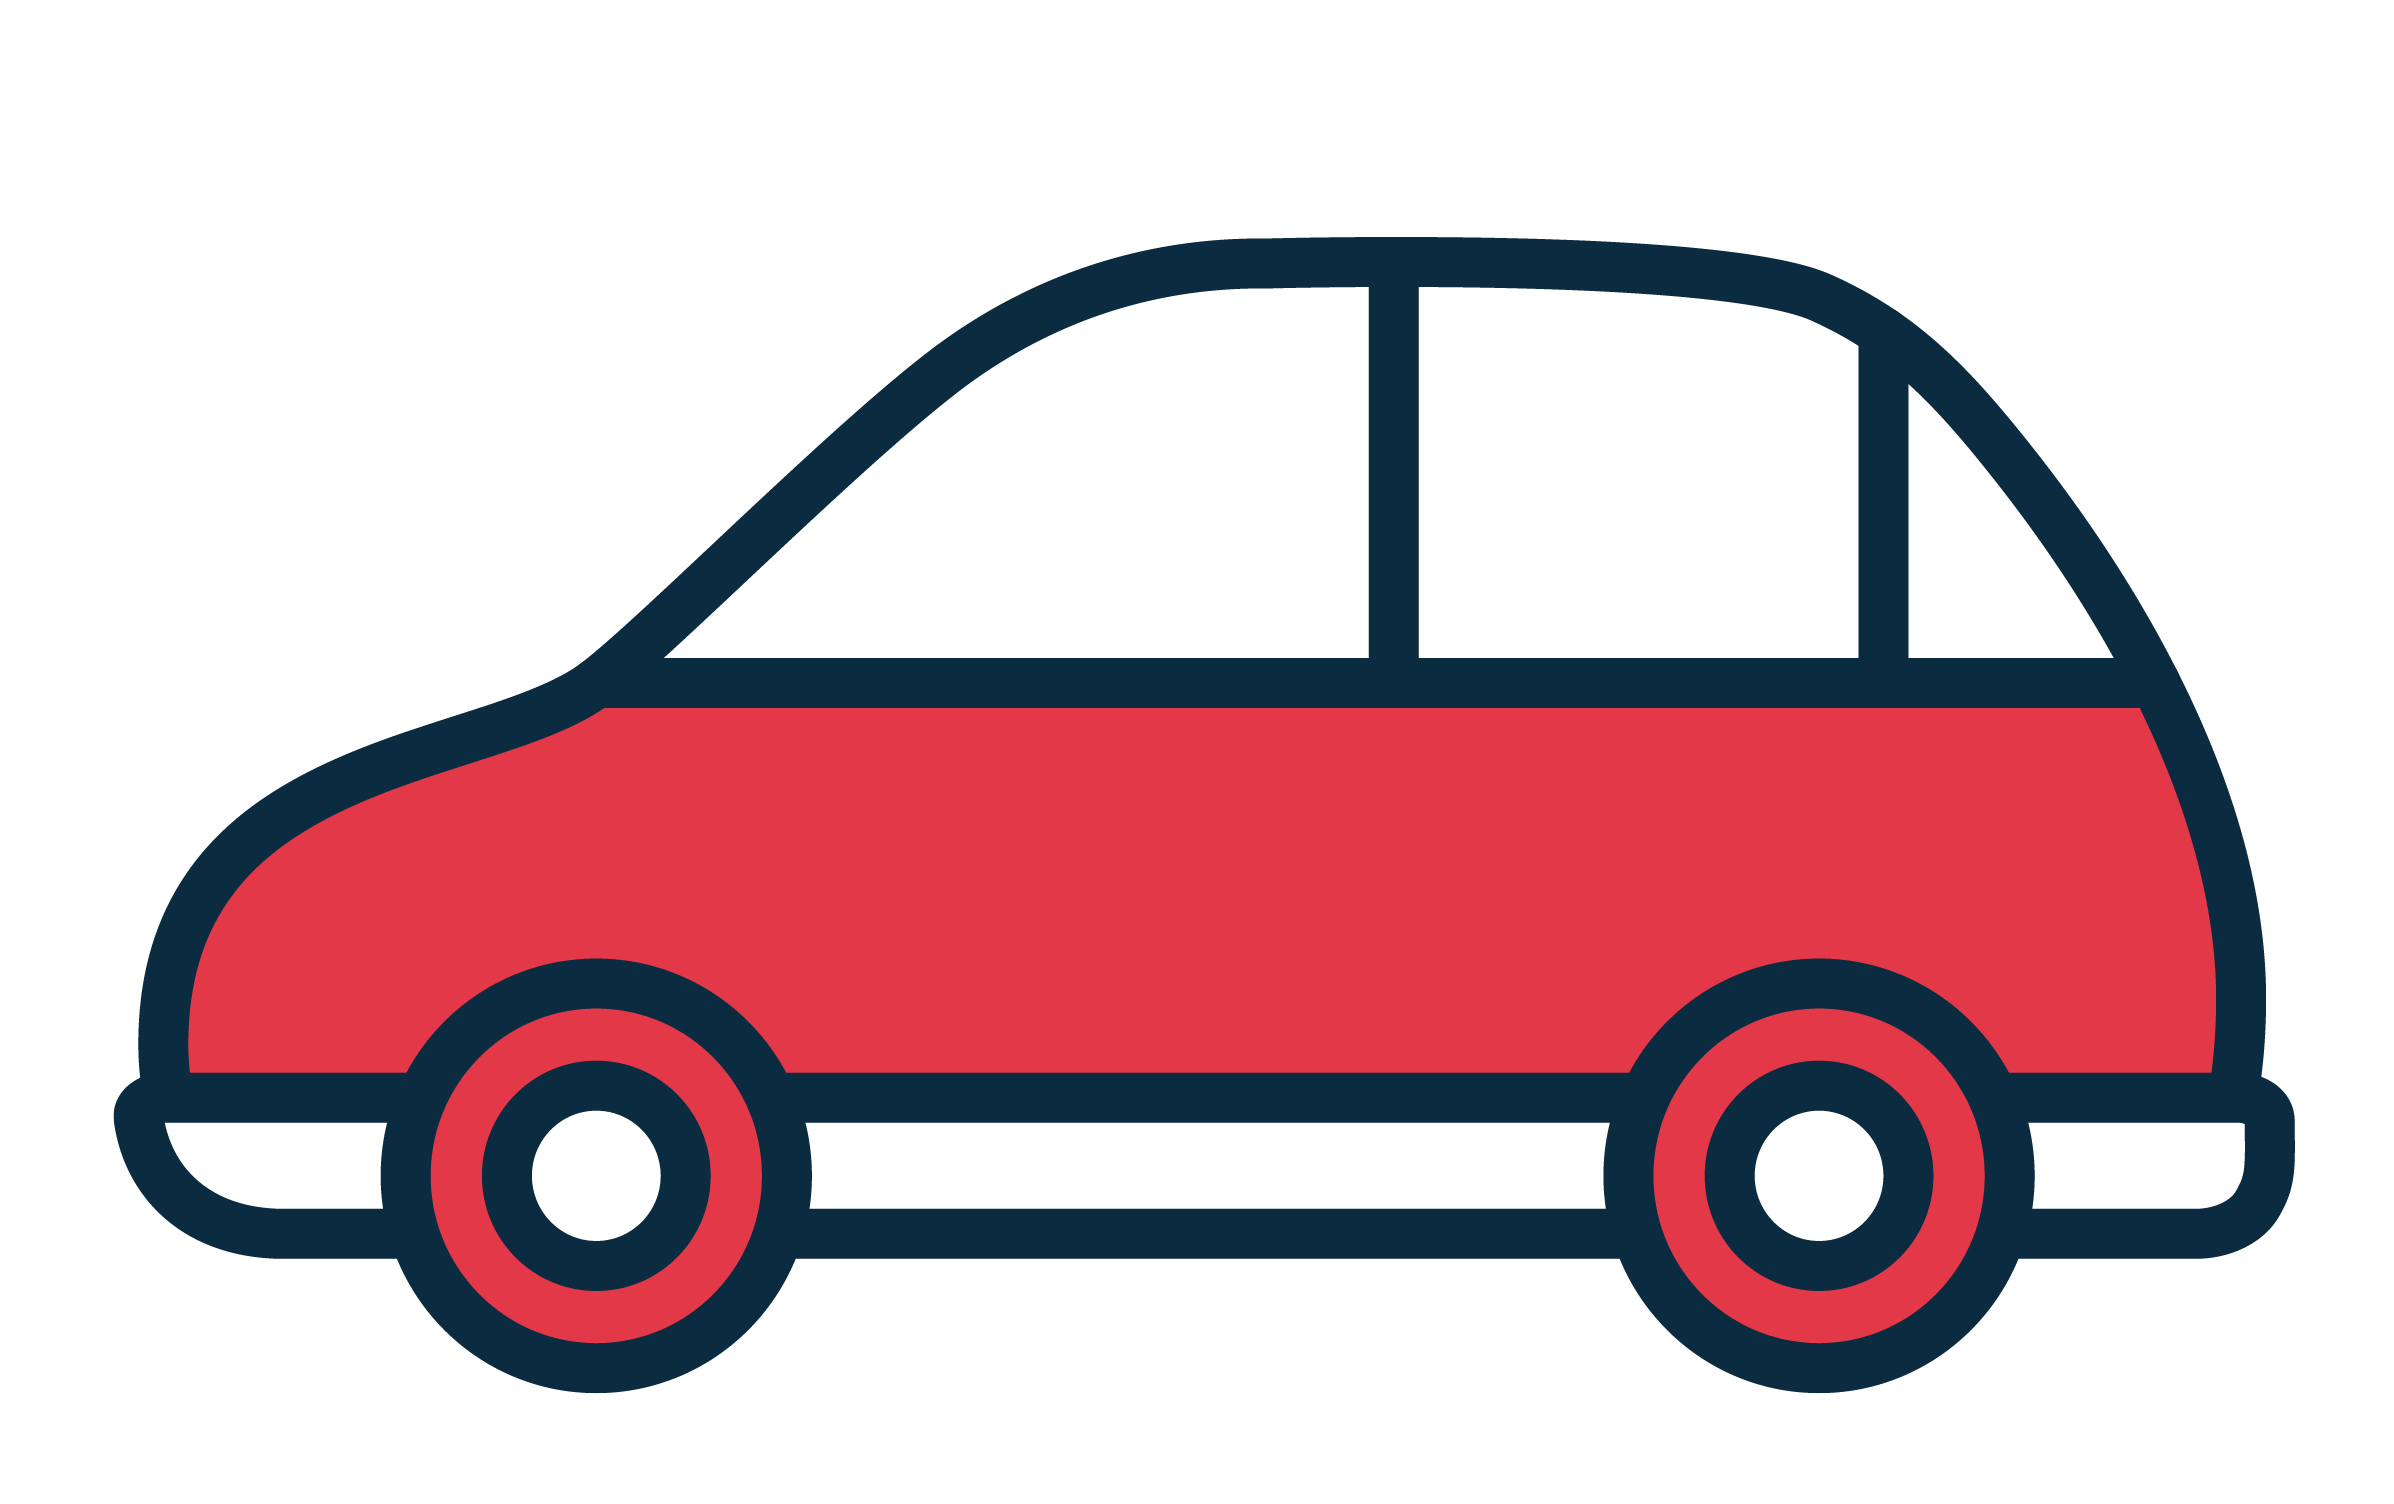 Endsleigh car insurance - Promo